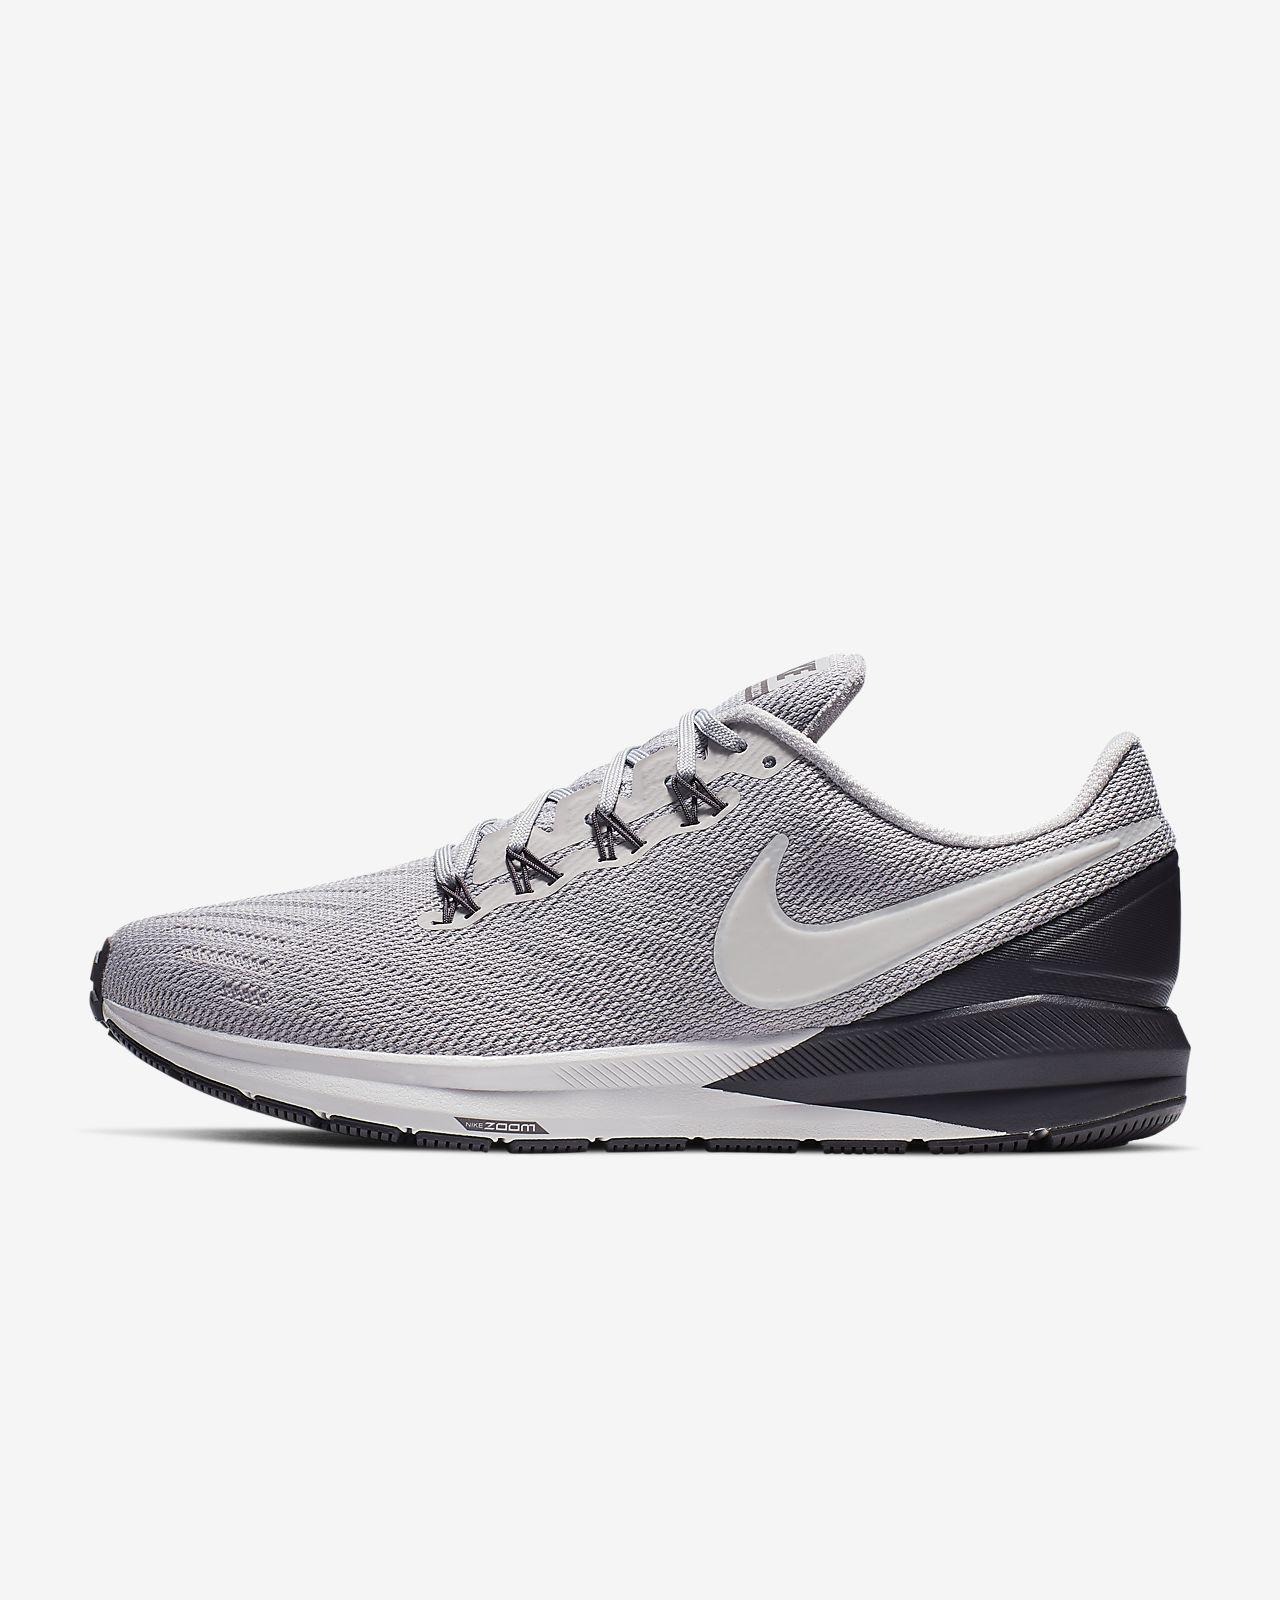 Sapatilhas de running Nike Air Zoom Structure 22 para homem